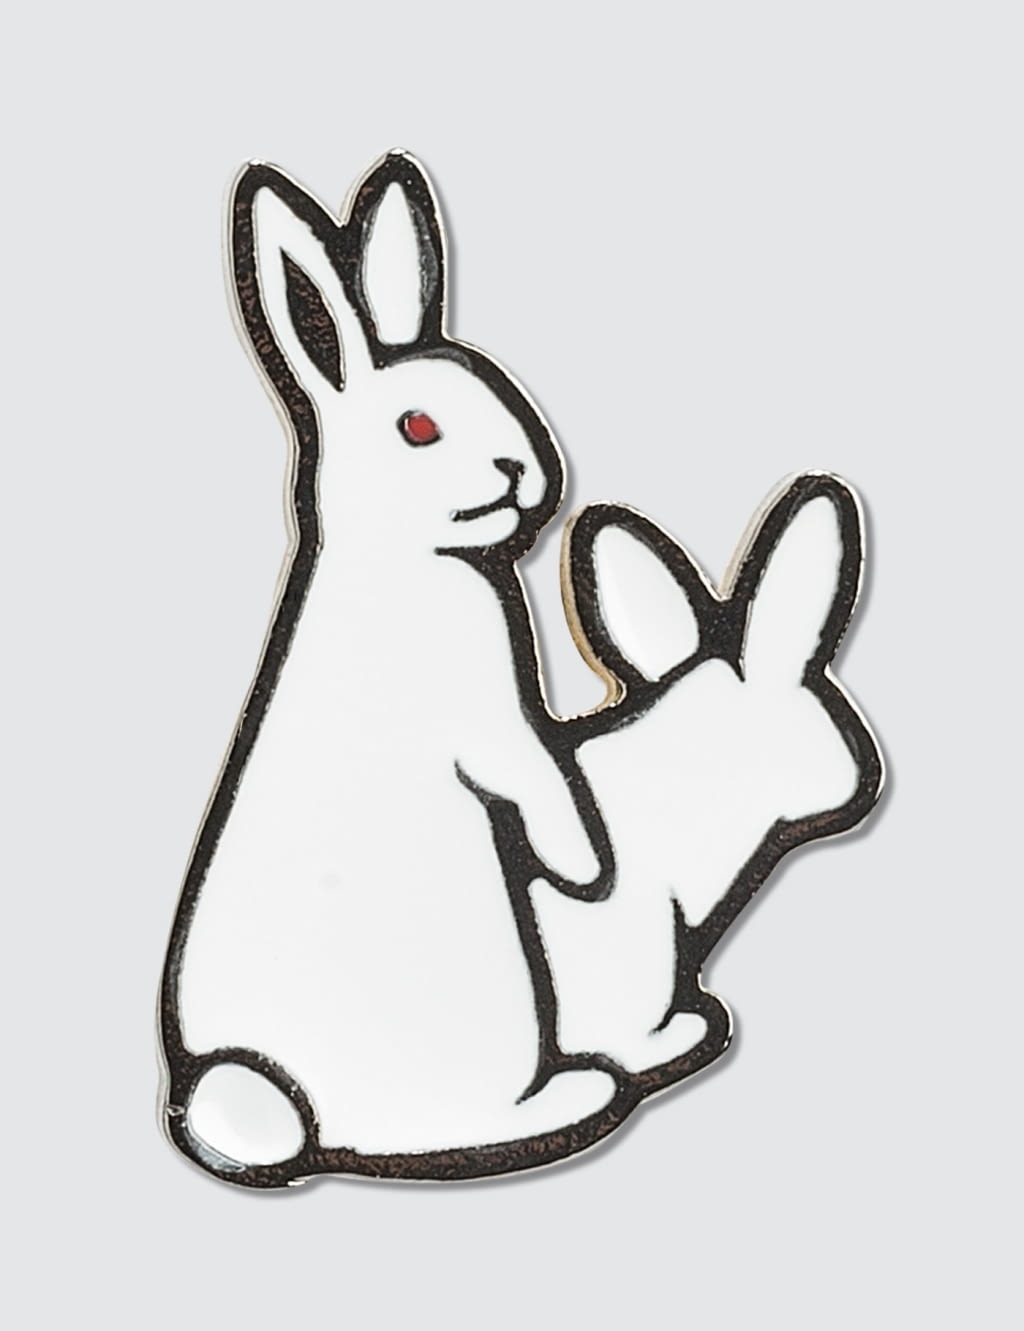 Buy Original Fr2 Fxxking Rabbits Pin At Indonesia Bobobobo Kaos Pria T Shirt Short Sleeve Sy761